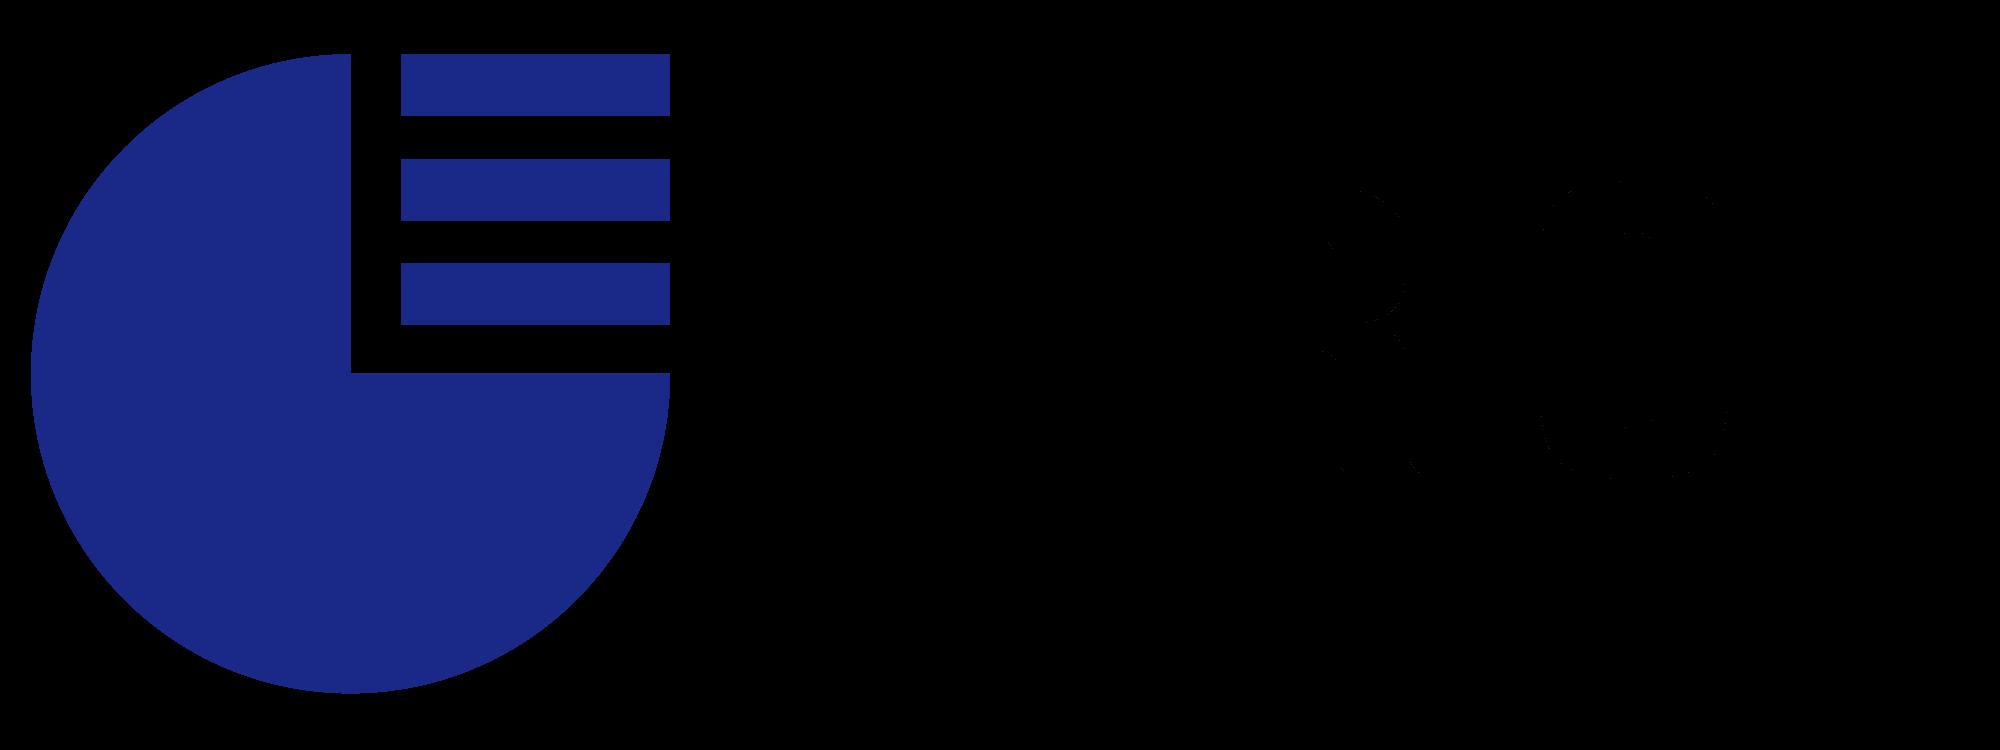 Eirich logo leverandør